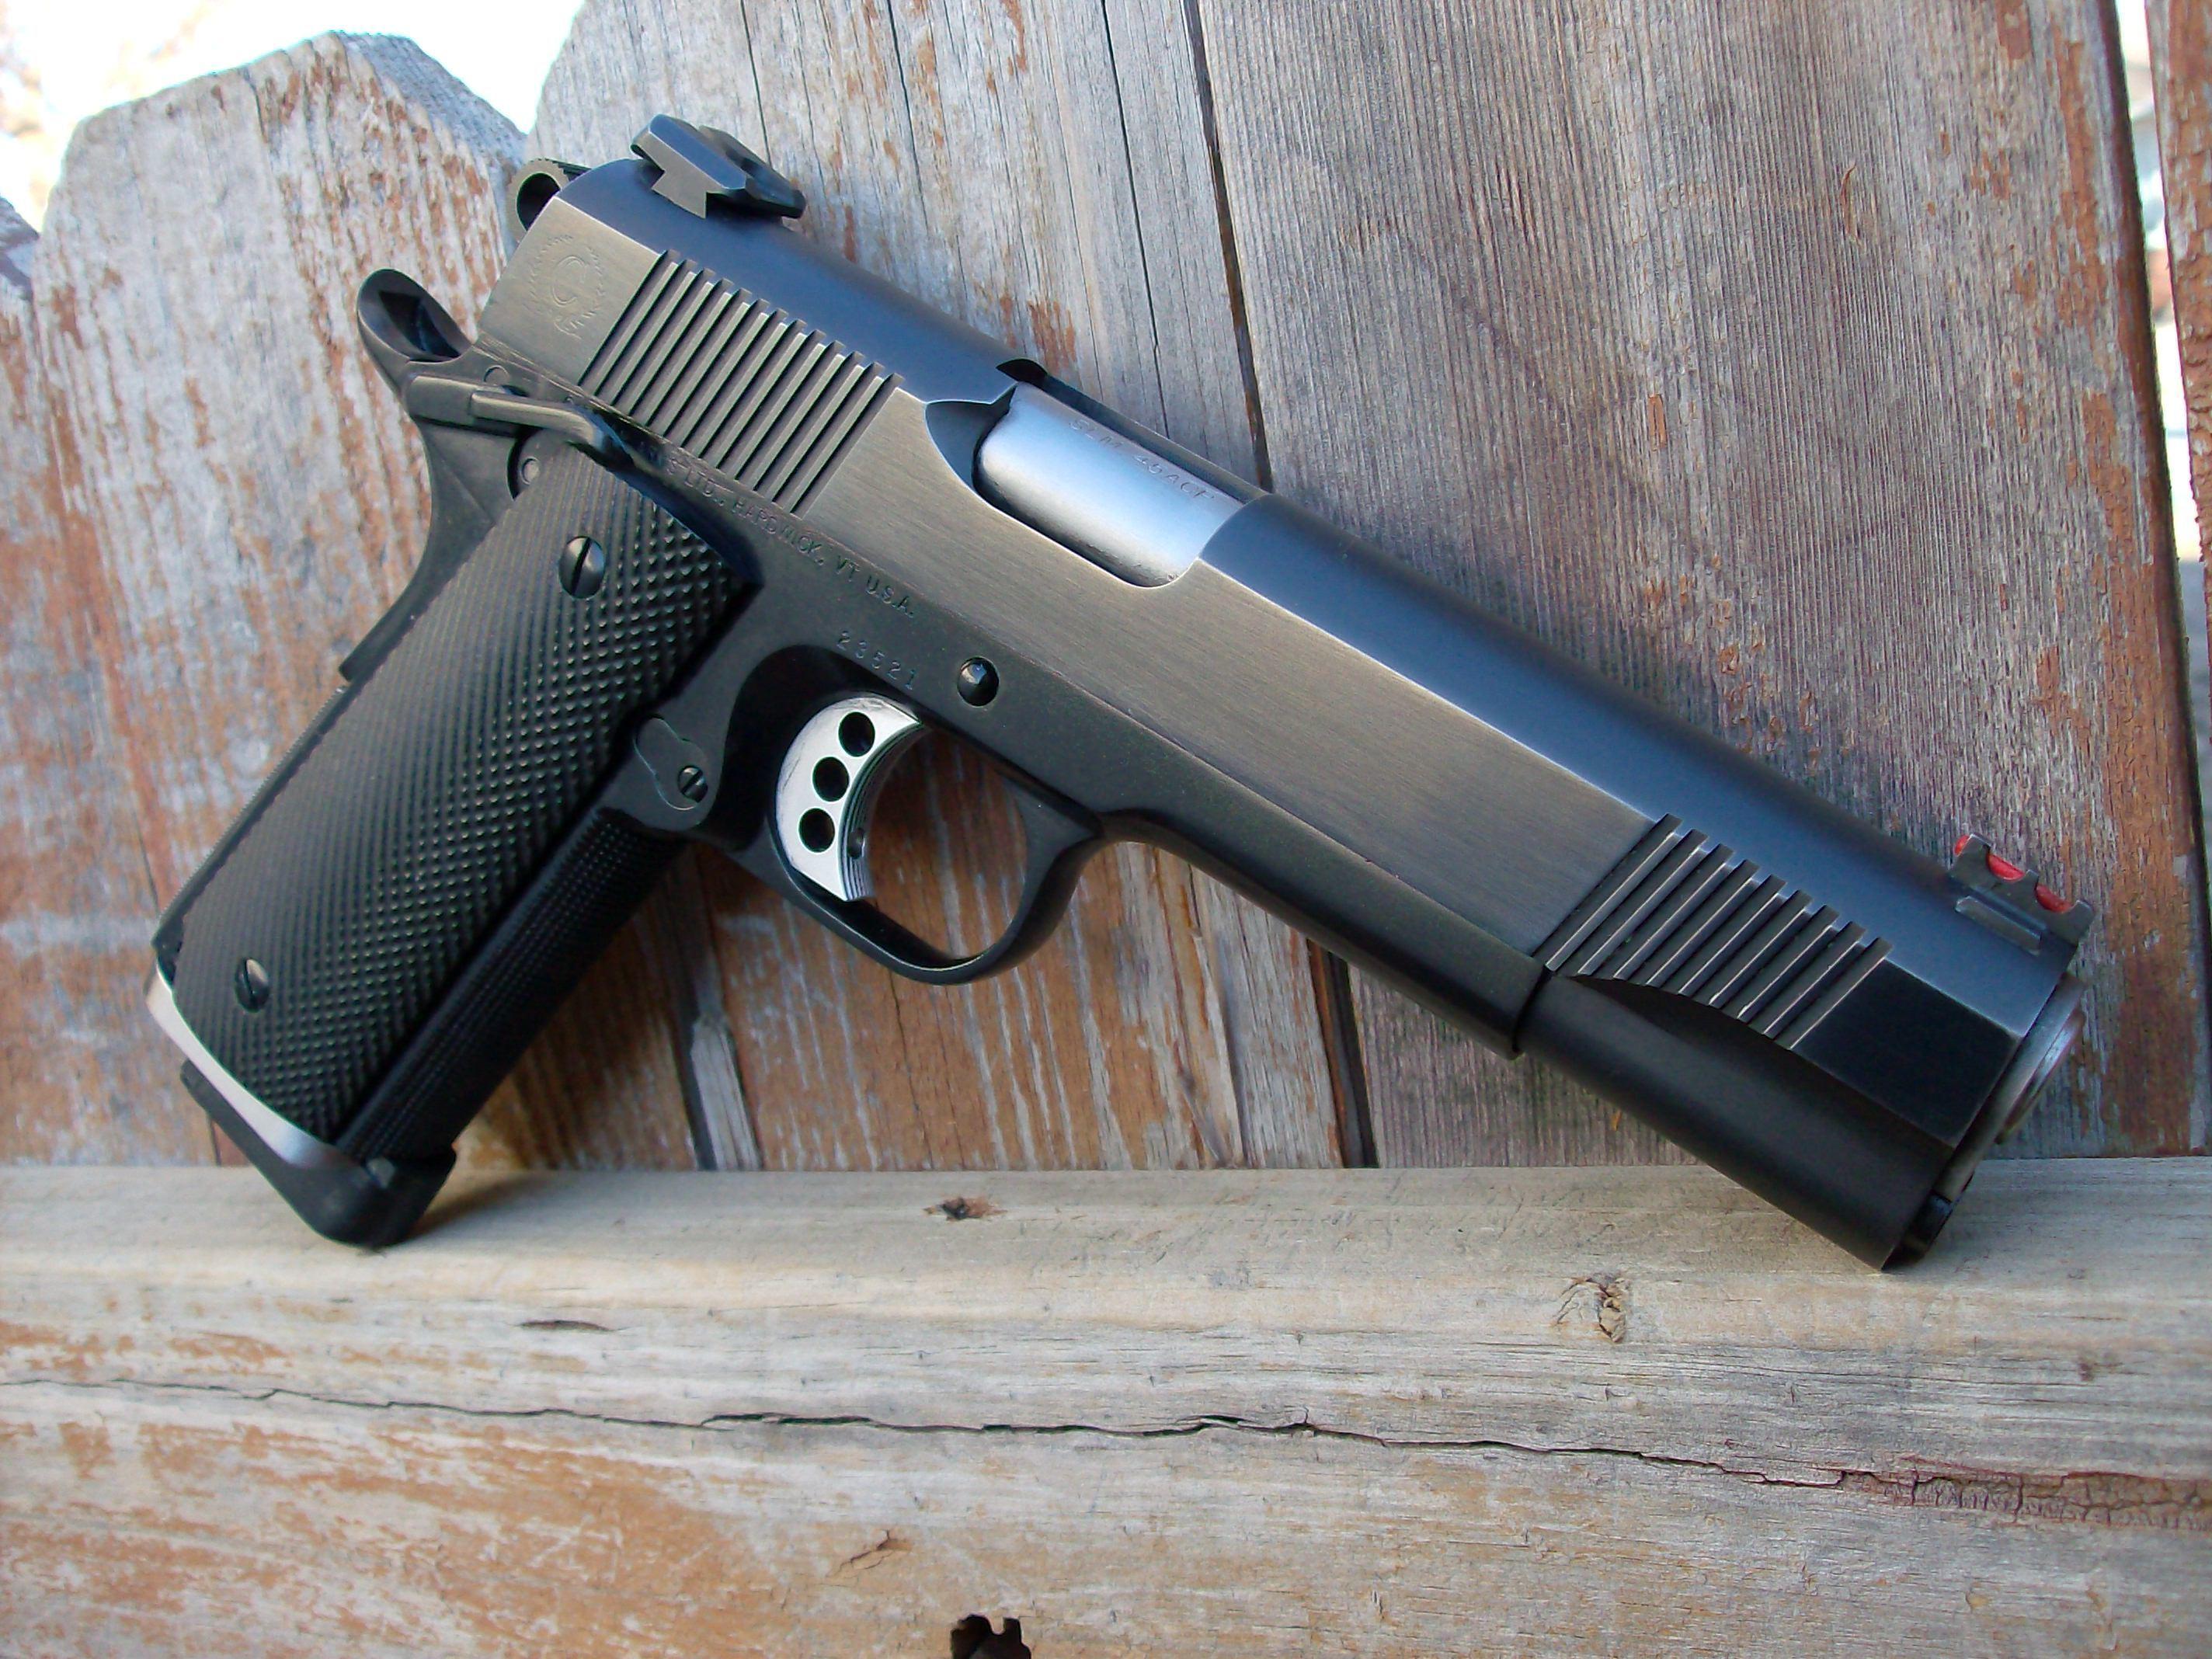 Colt 1911 Pistol Computer Wallpapers Desktop Backgrounds 2848x2136 2848x2136